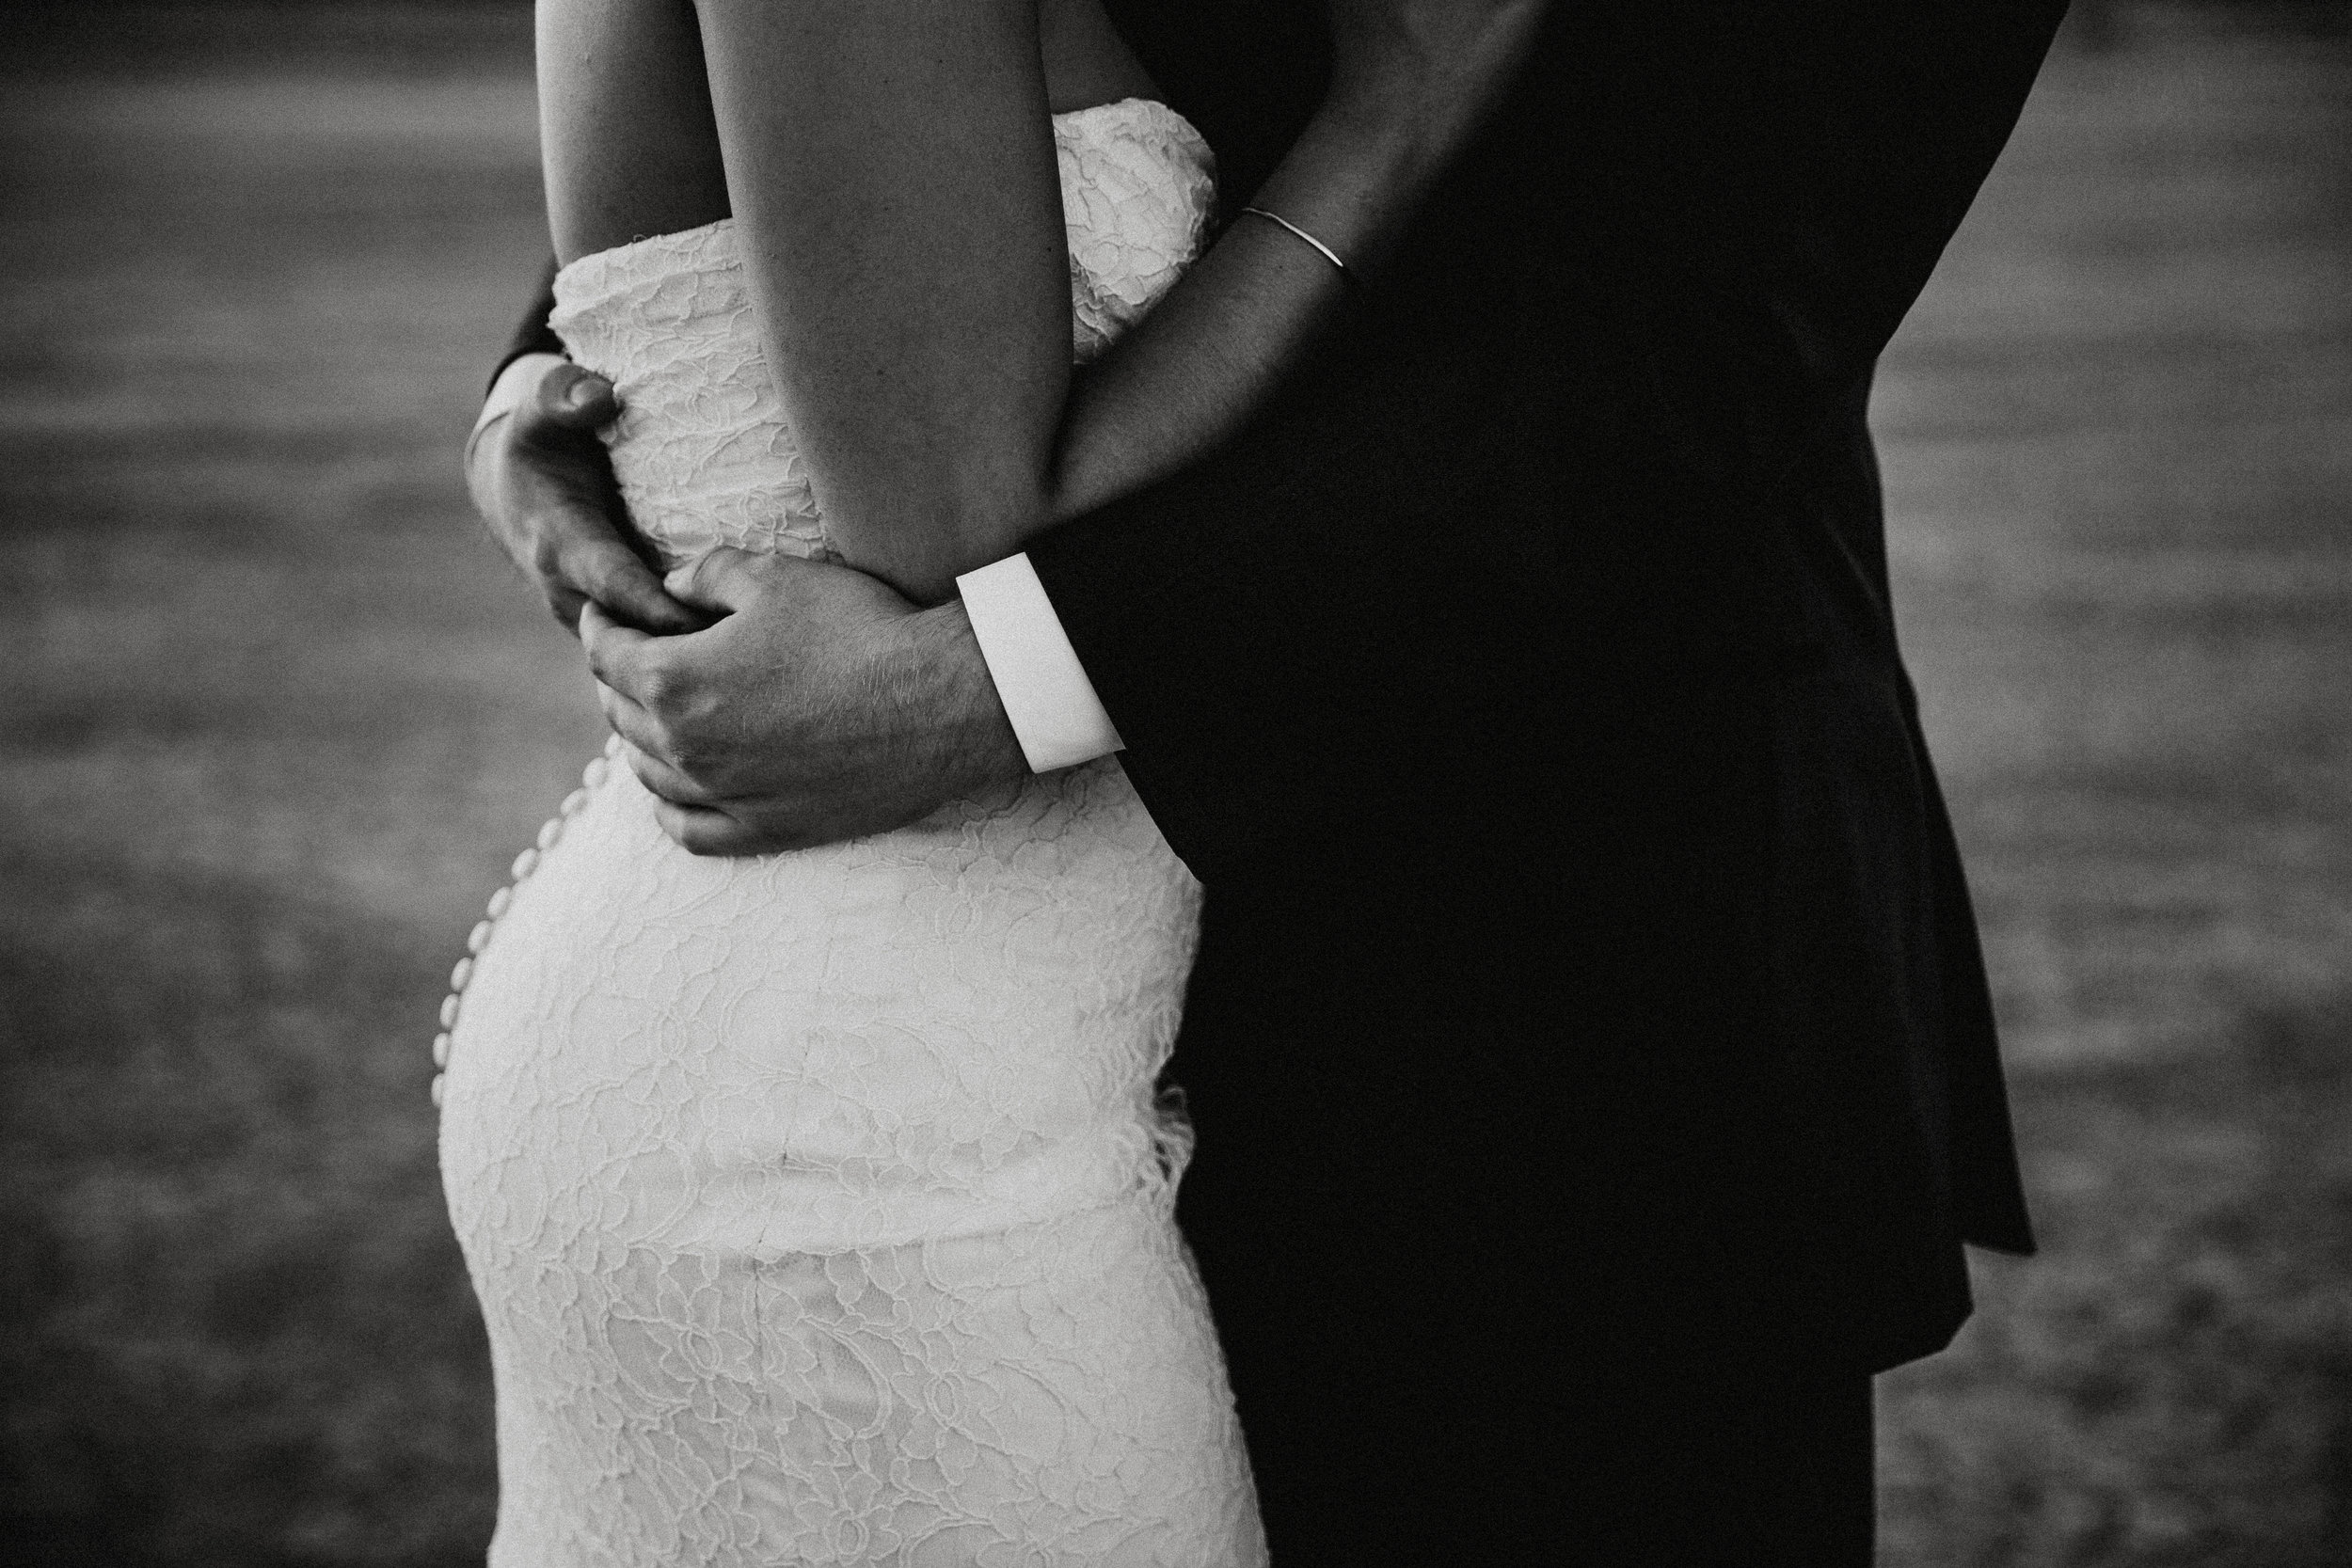 Las Vegas Wedding Photographer - Moody Wedding Photographer - Henderson, NV - Seattle Elopement Photographer - PNW Wedding Photographer - Henderson, NV - Wedding Details - First Look